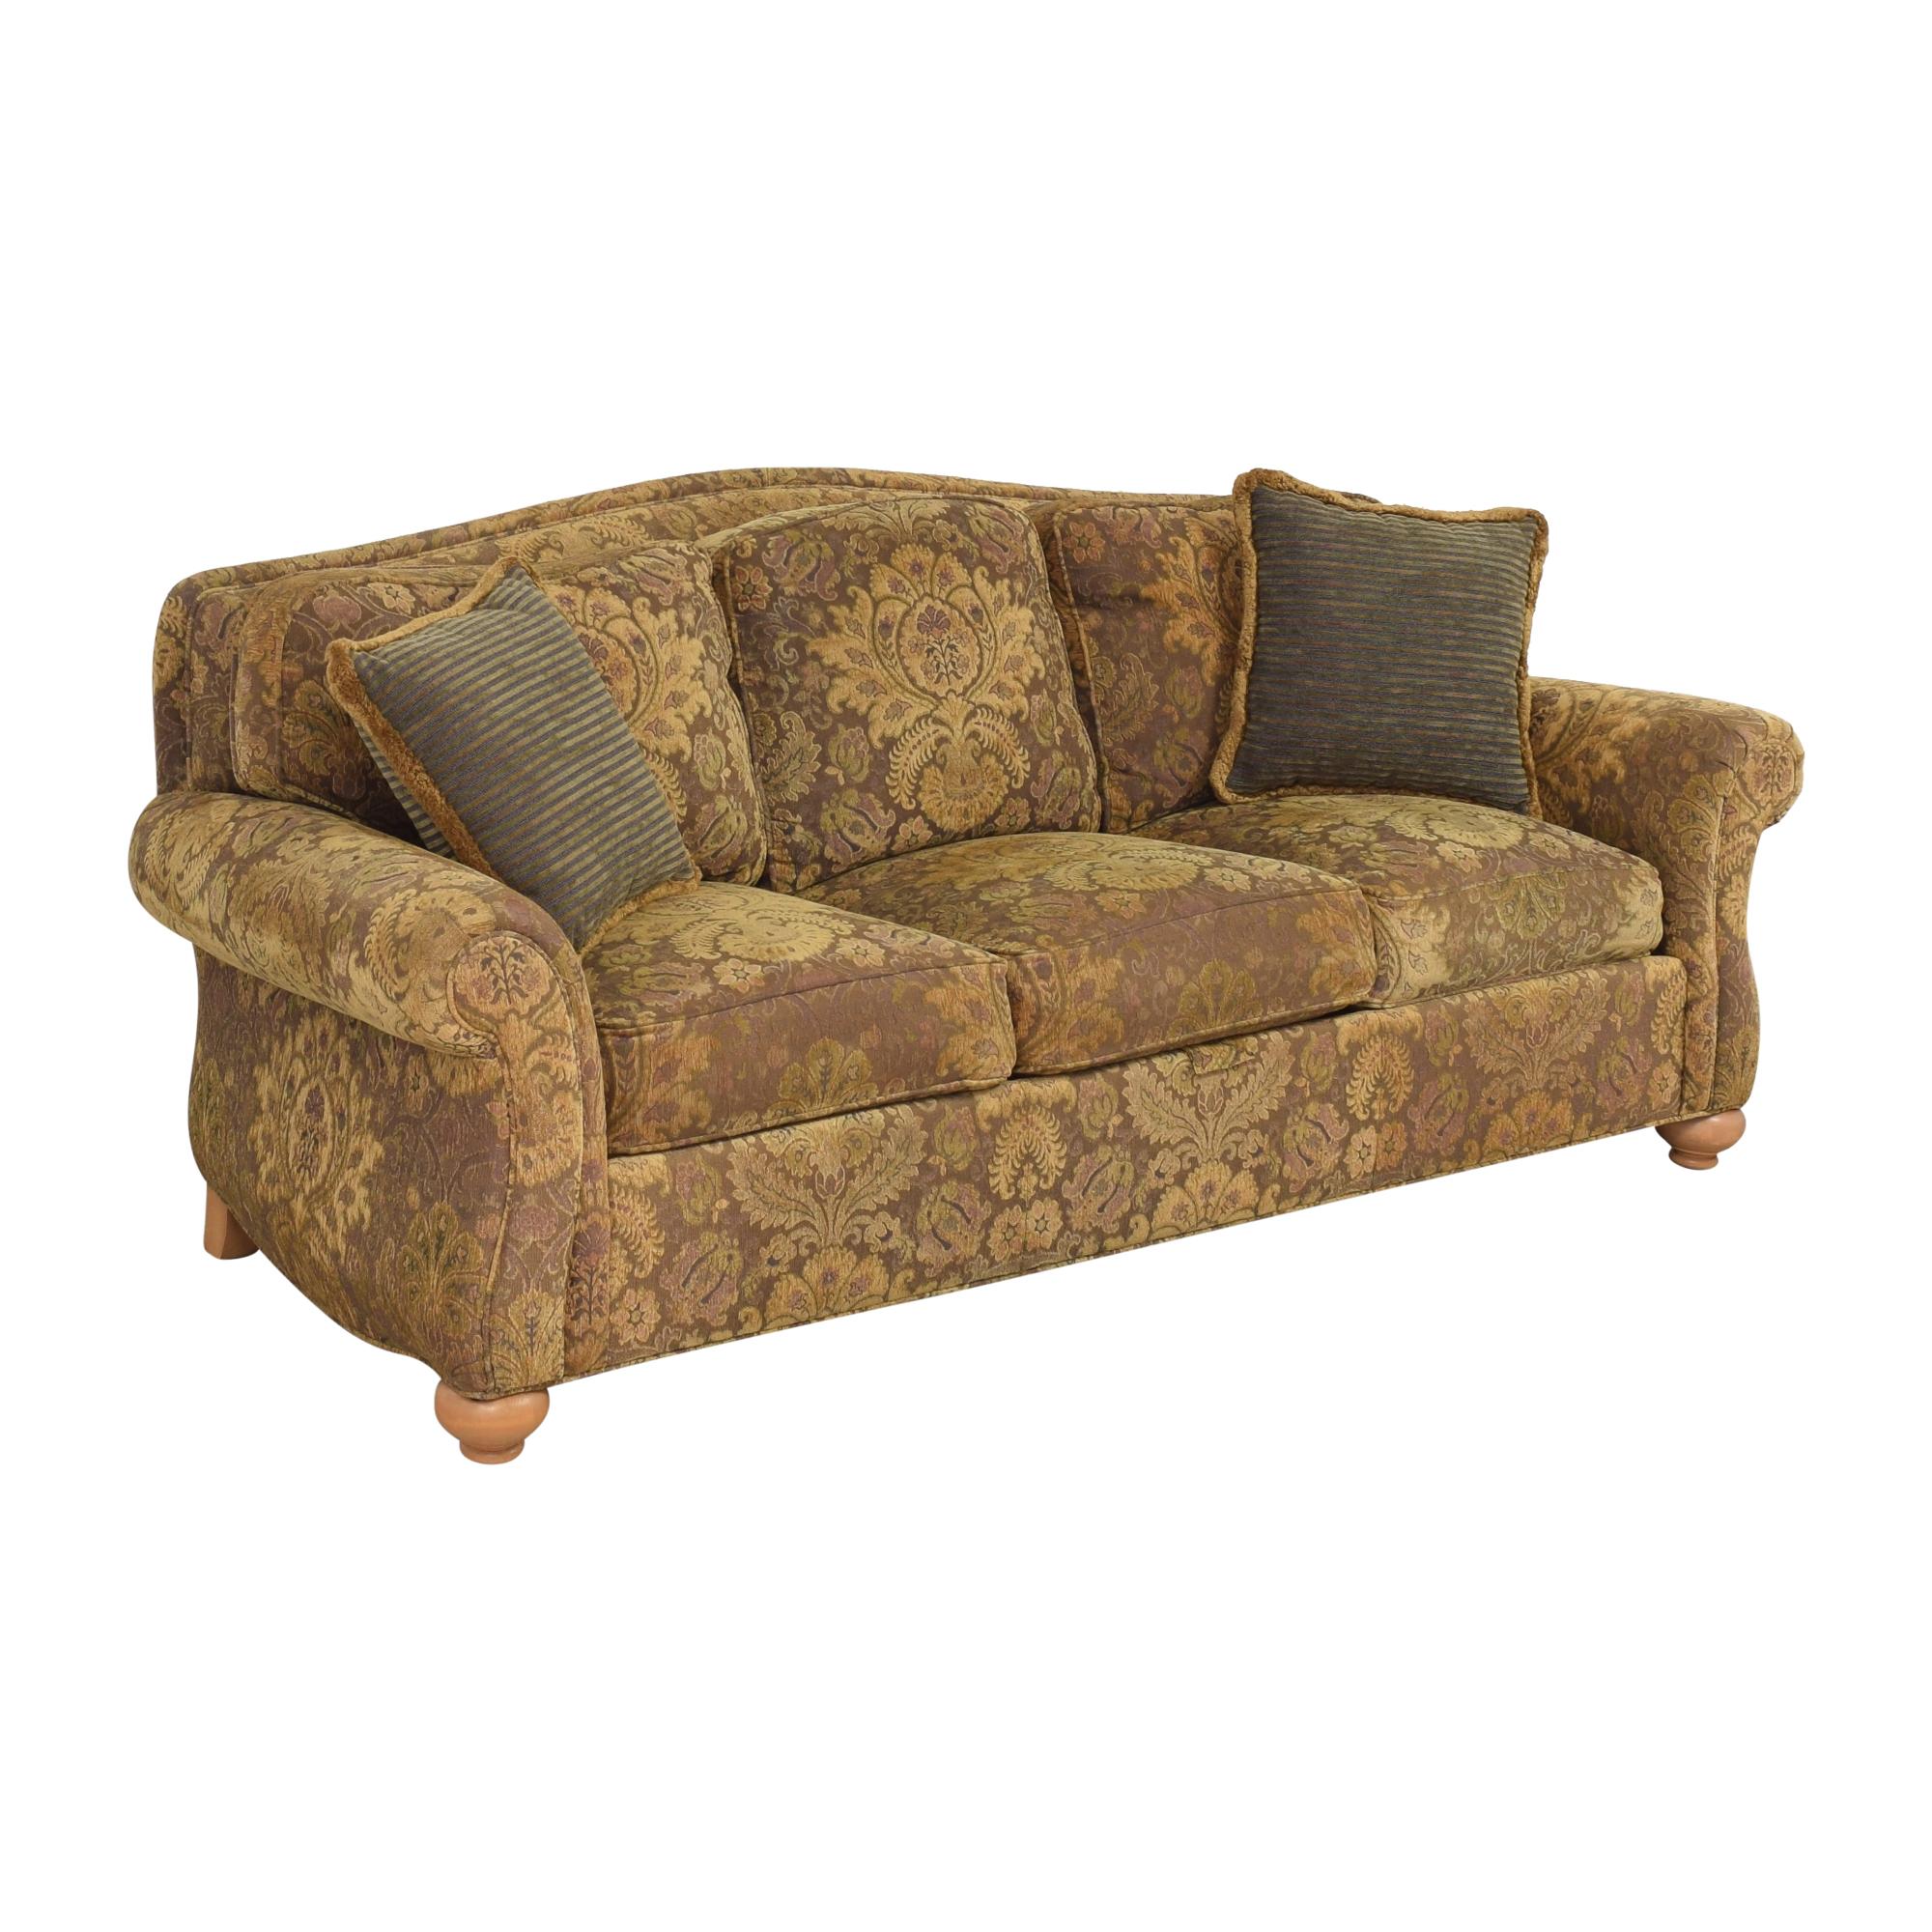 Ethan Allen Ethan Allen Camel Back Sofa ma